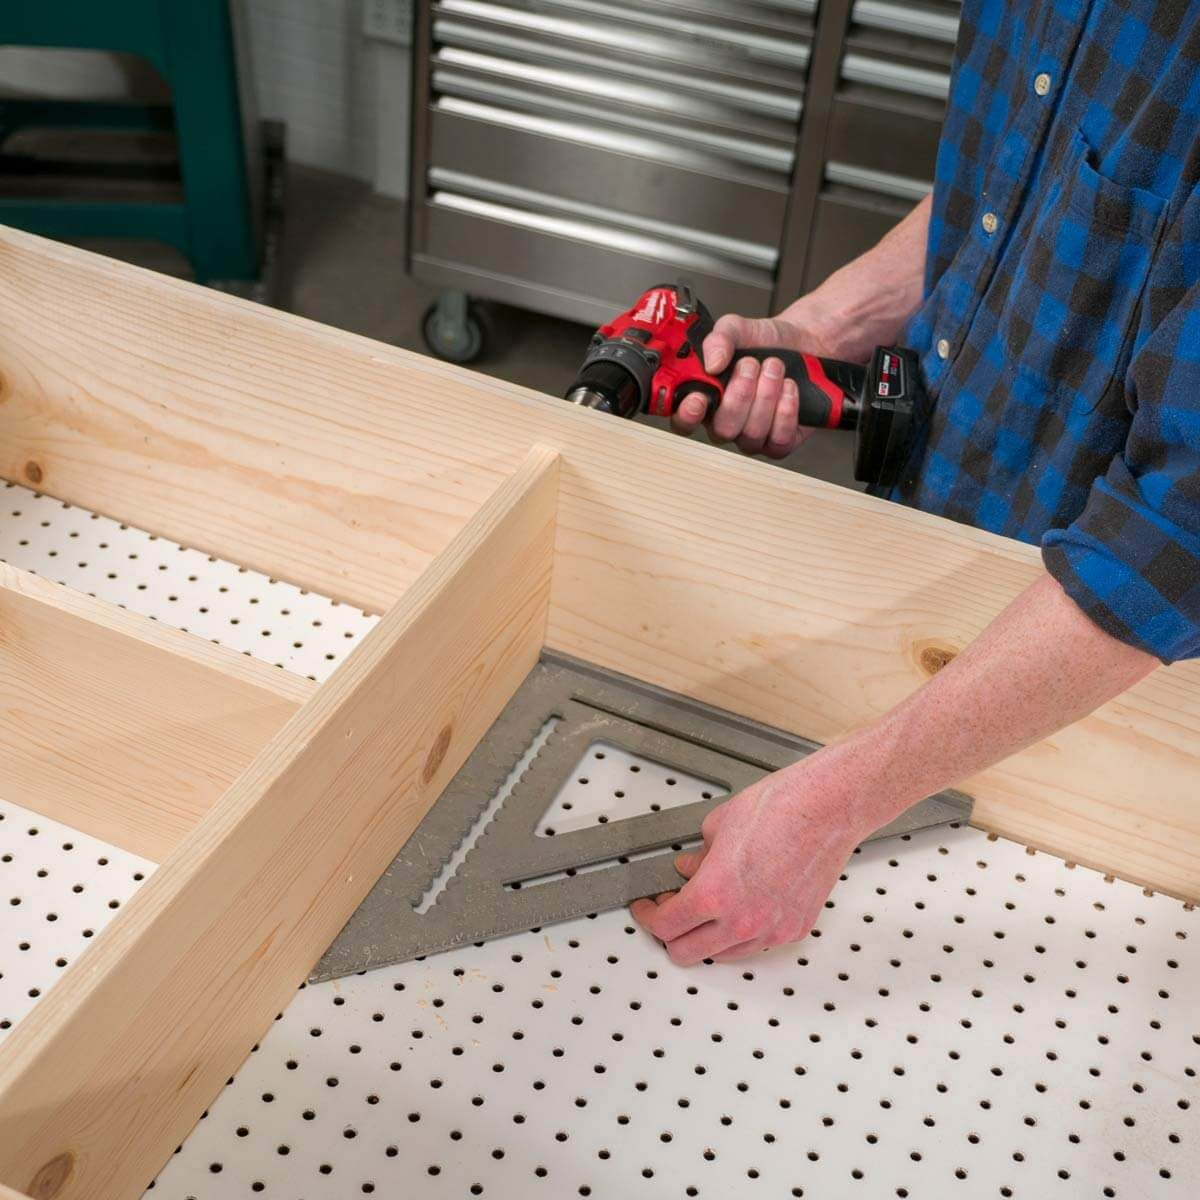 Fold Up Workbench Add Shelves